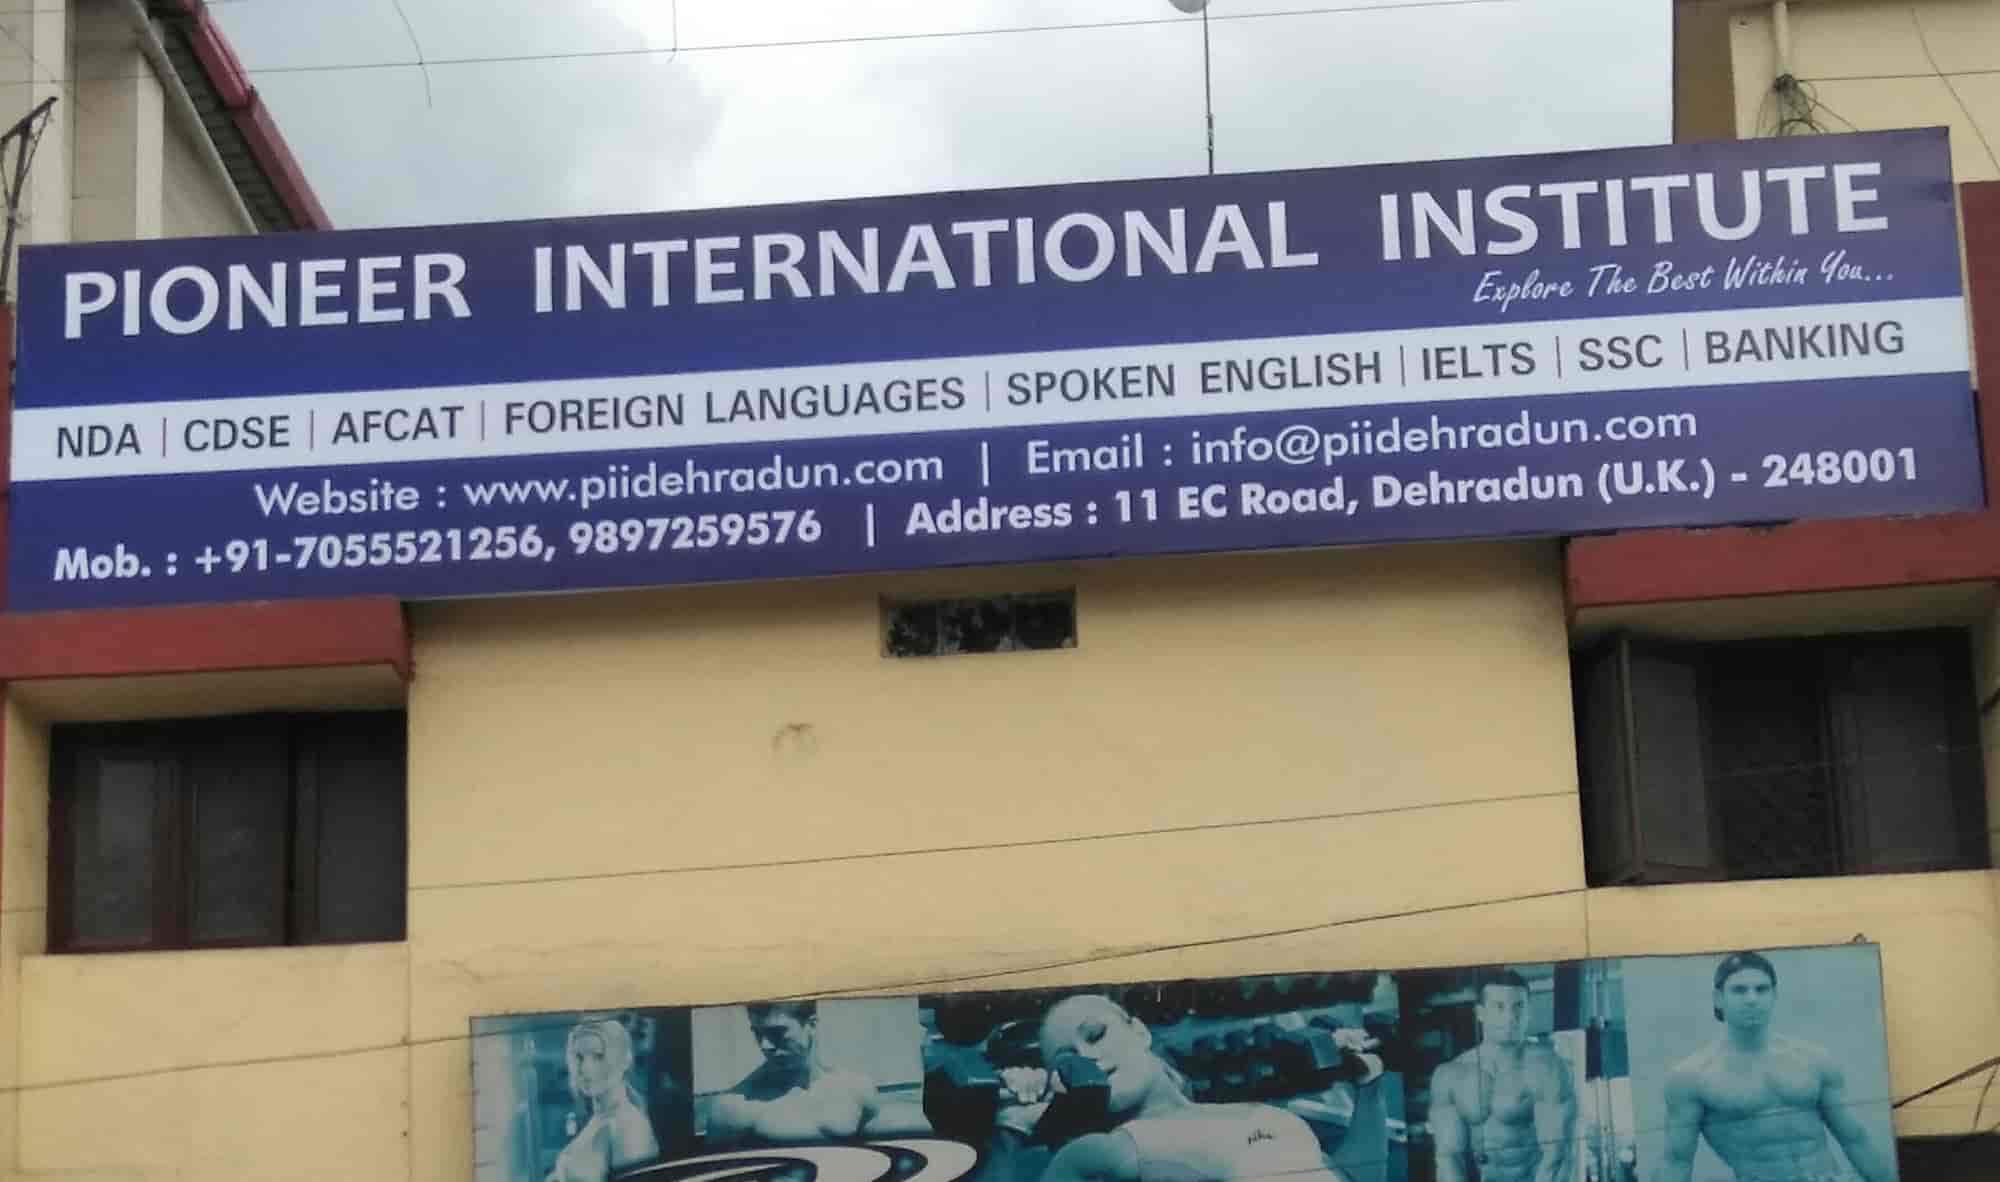 Top 10 Foreign Language Classes in Race Course, Dehradun